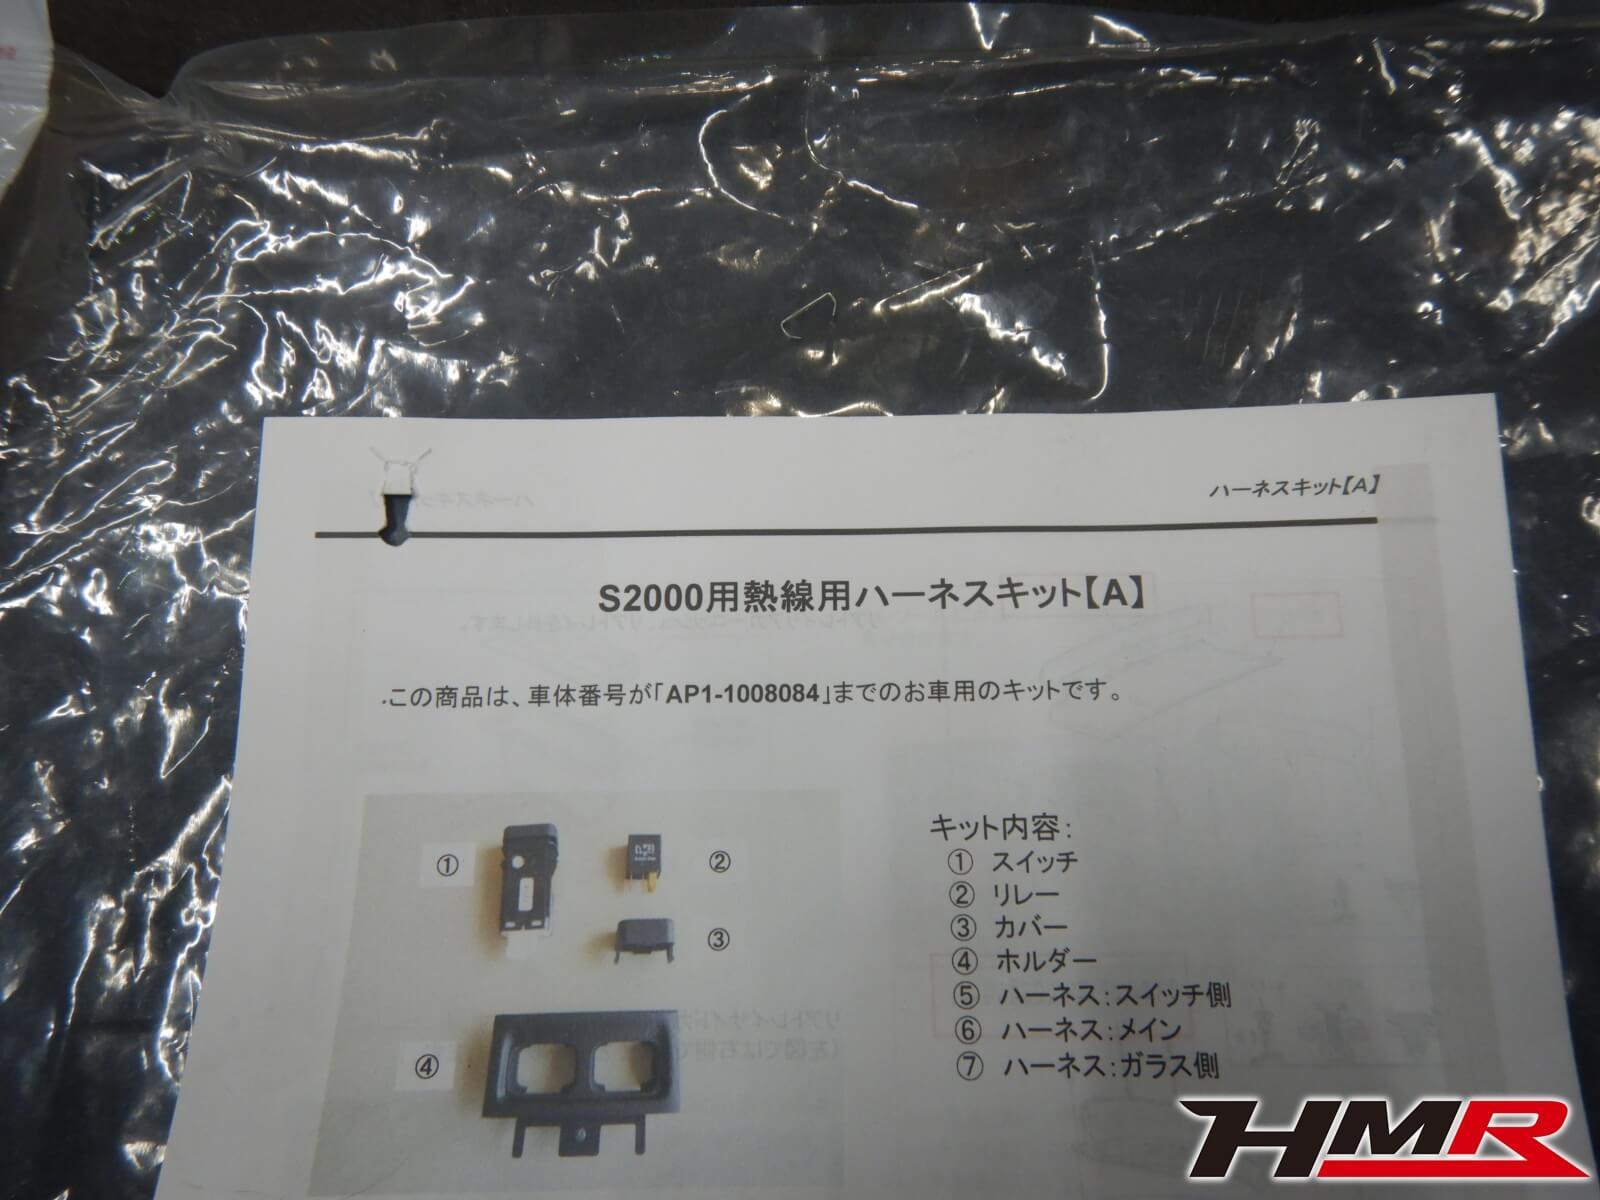 S2000(AP1)幌交換